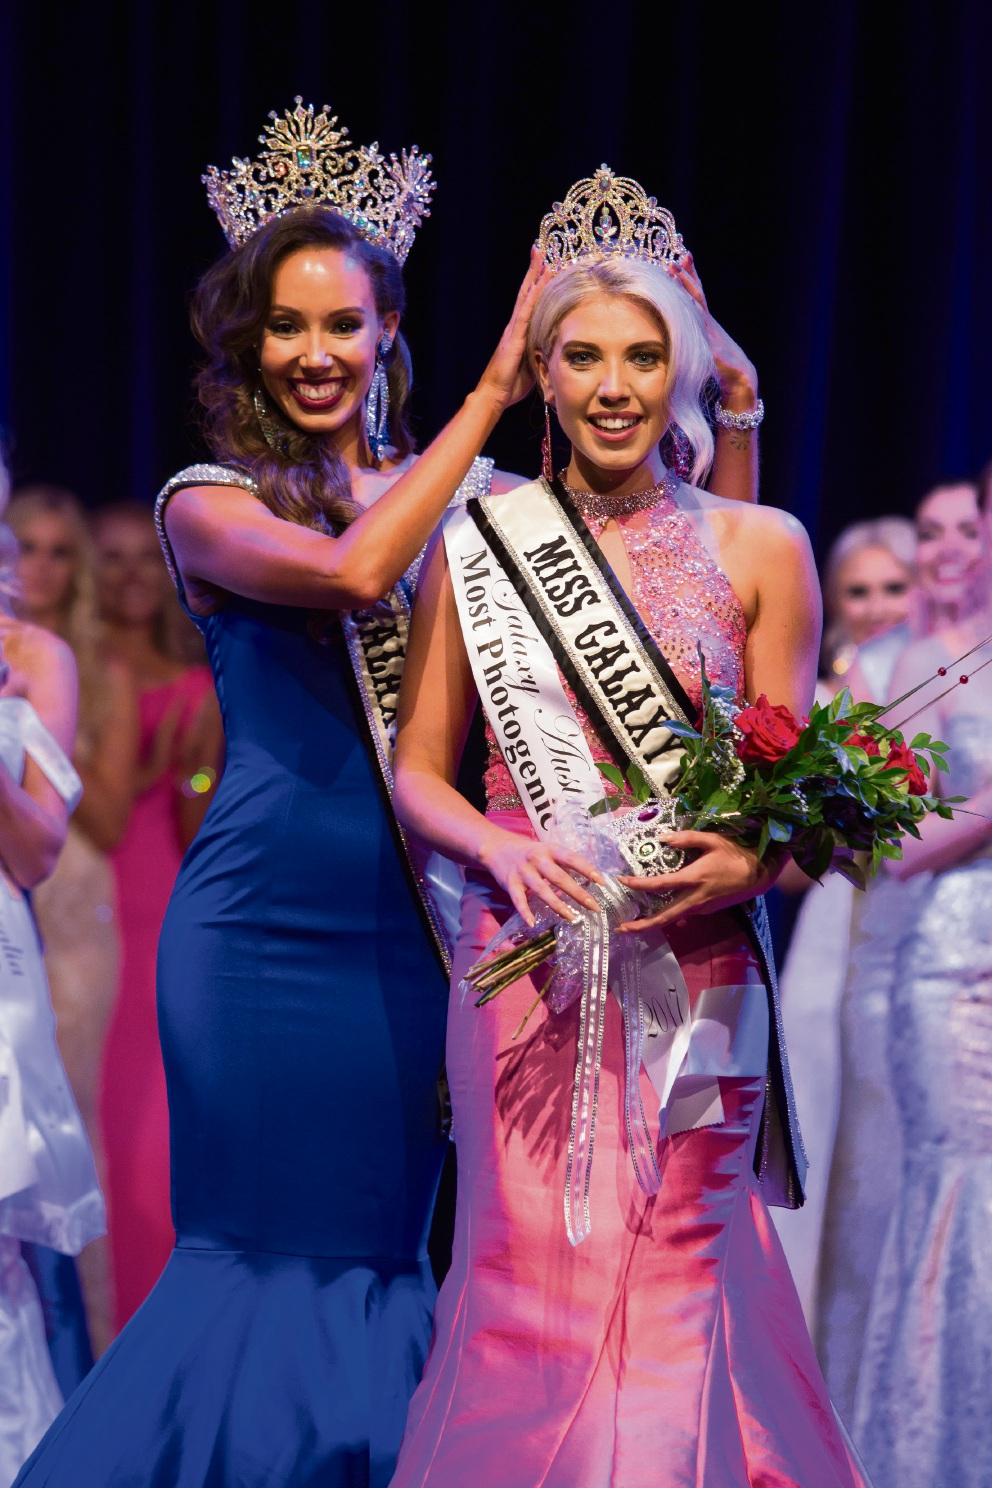 Elise Nazzari is crowned Miss Galaxy Australia.